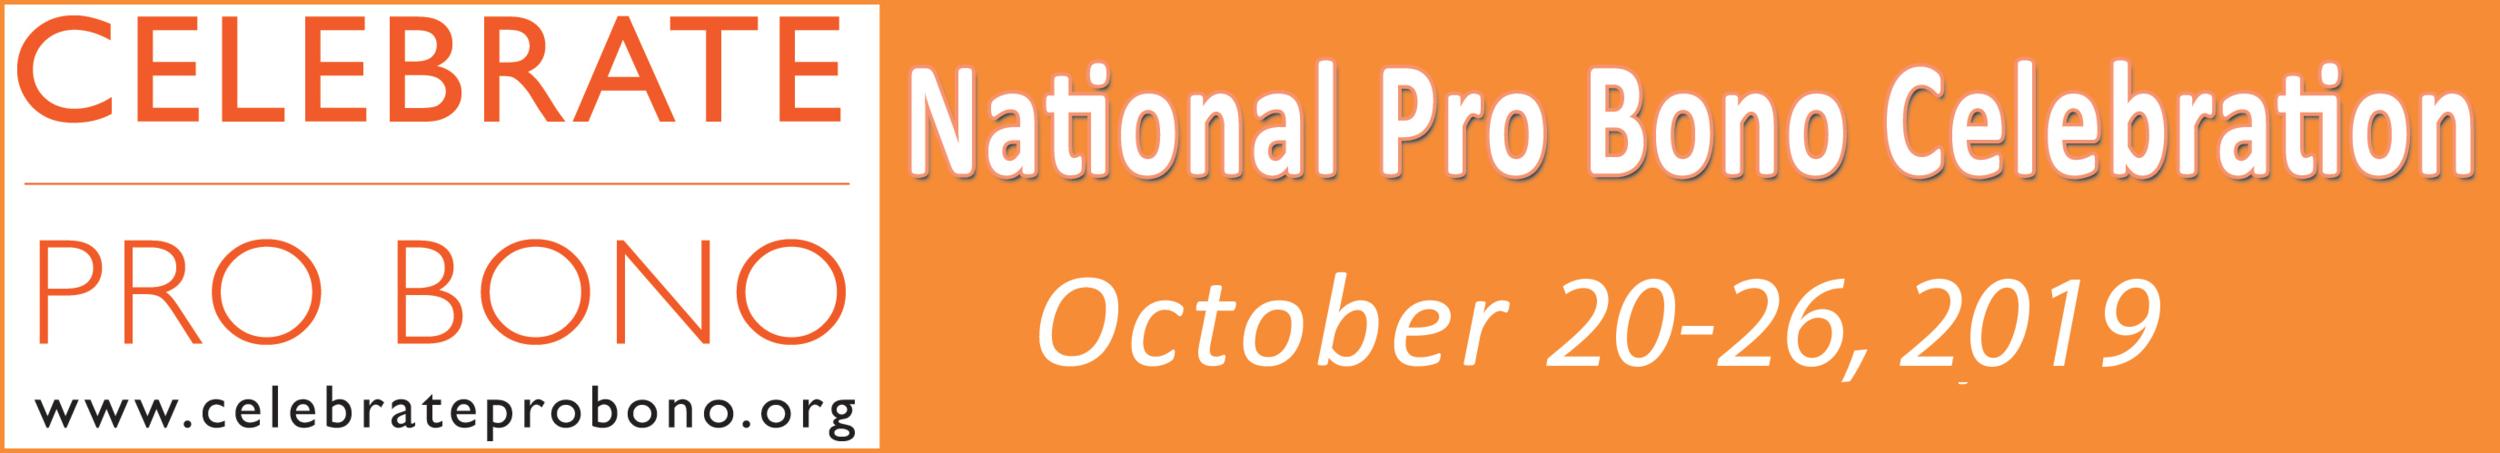 pro-bono-website-banner.png